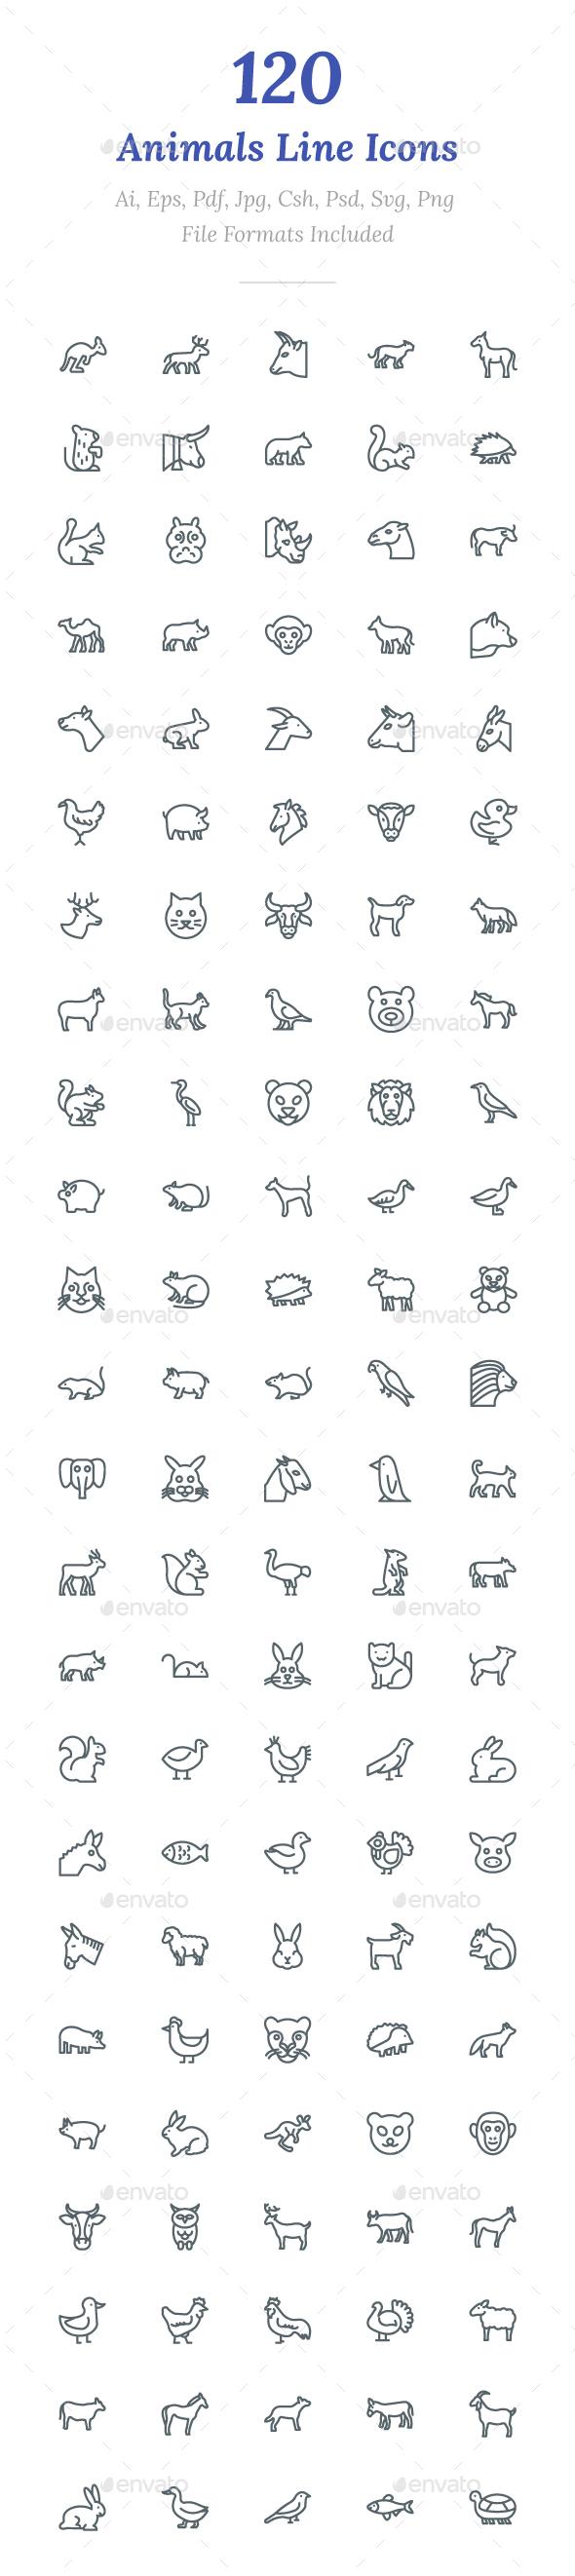 120 Animals Line Icons - Icons